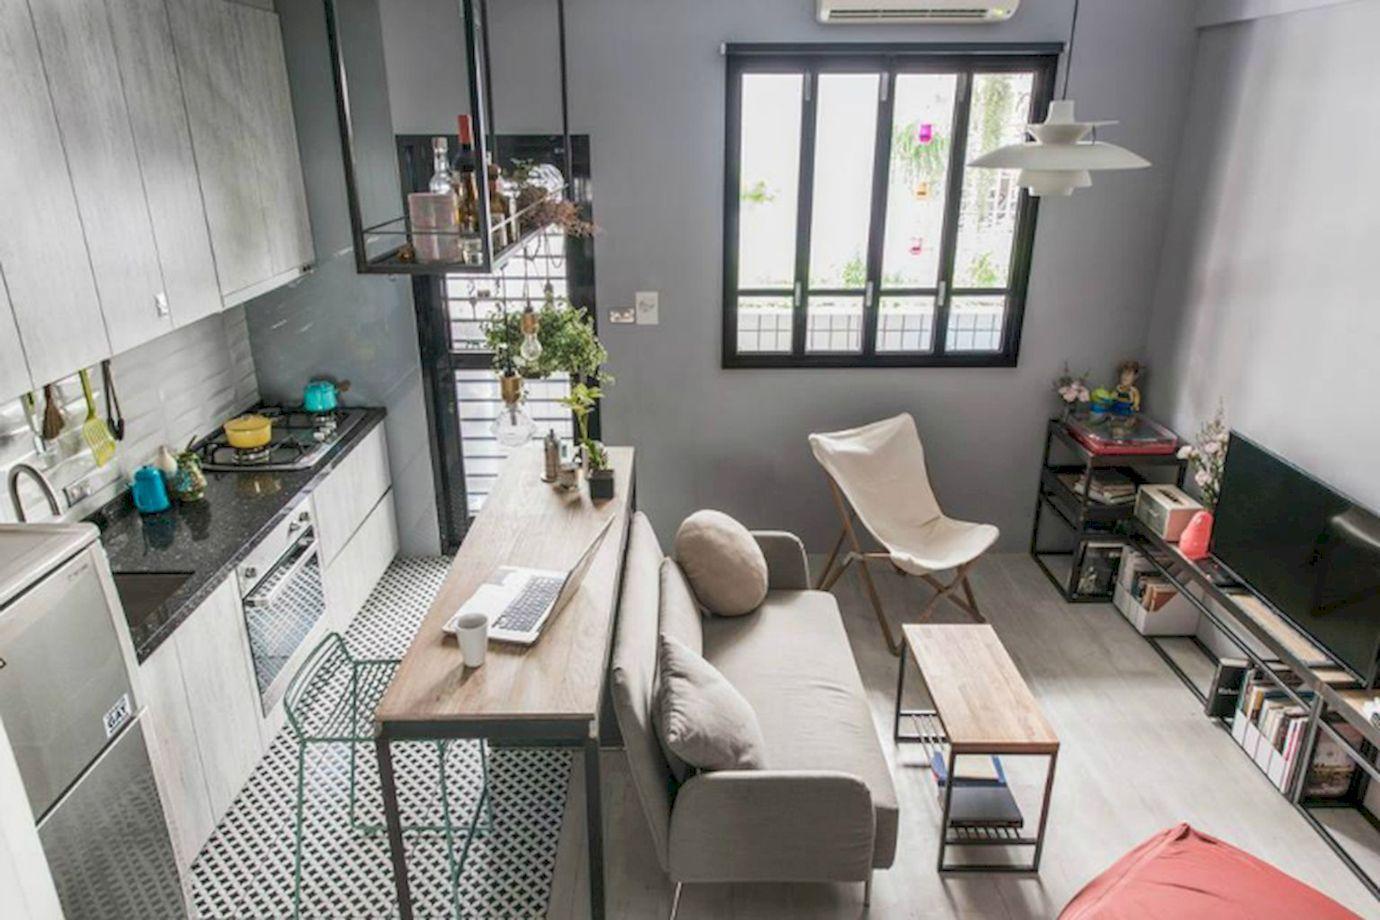 10 Cozy Minimalist Studio Apartment Decor Ideas | Small apartment ...